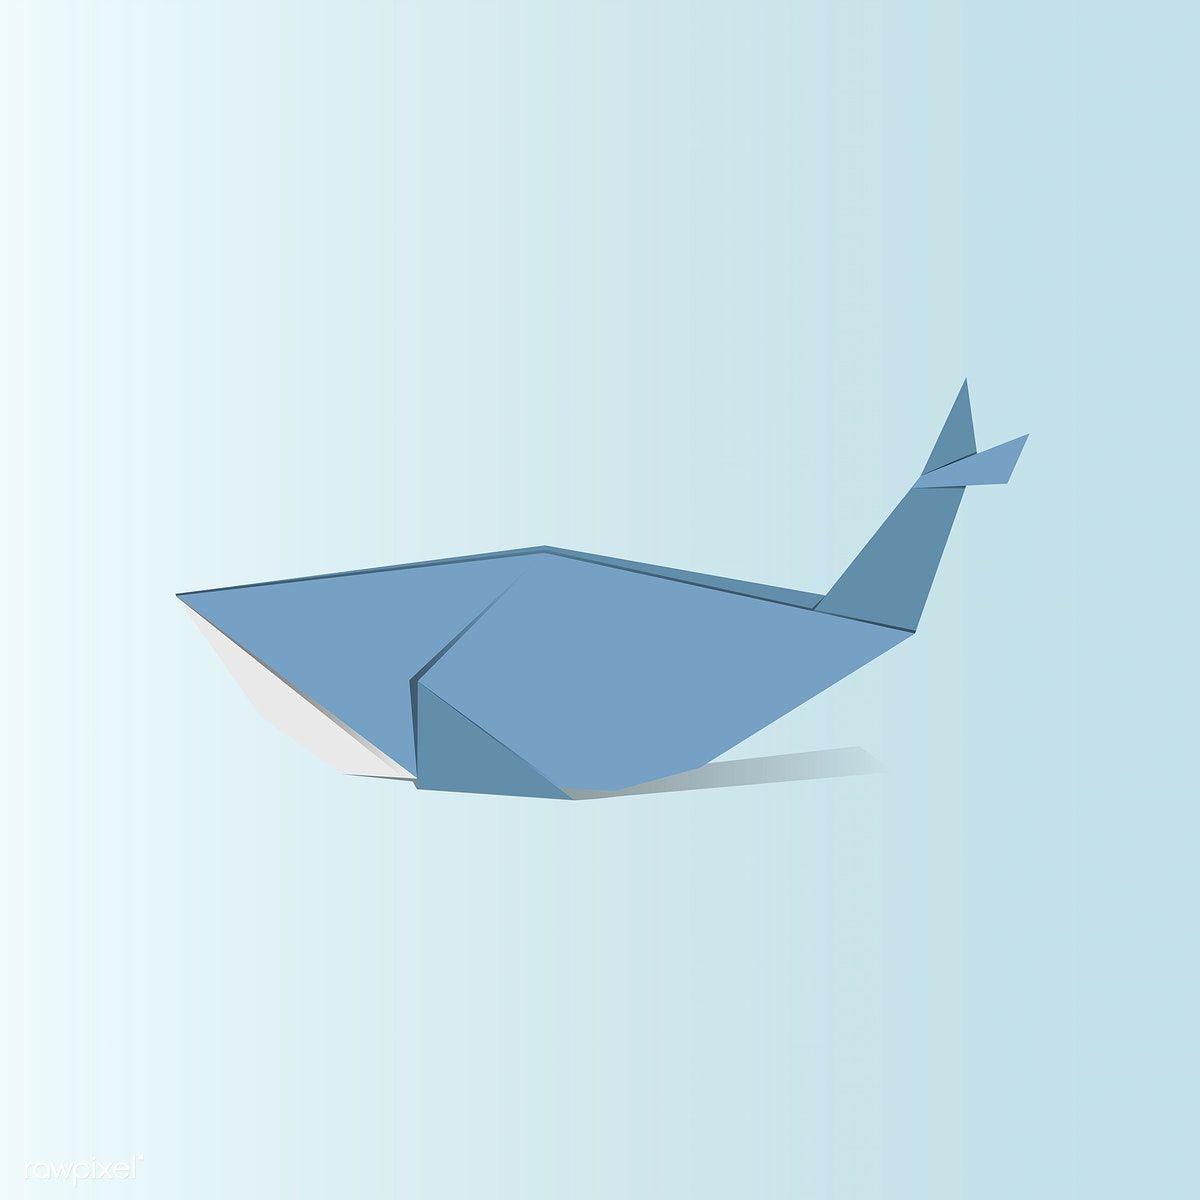 Animal origami vector   premium image by rawpixel com